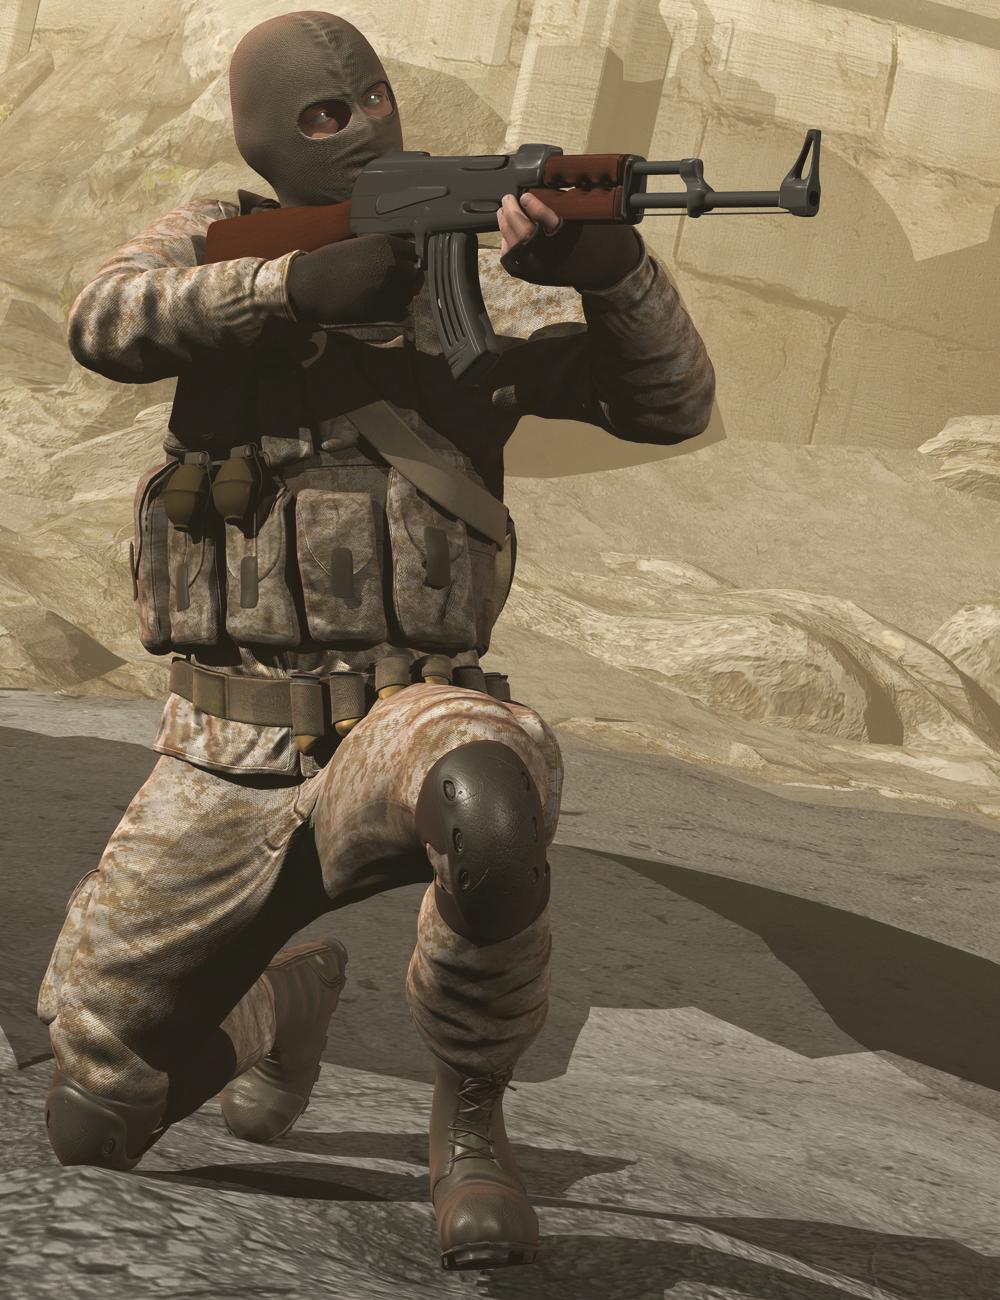 Soldier for Genesis 2 Male(s) by: Yura, 3D Models by Daz 3D